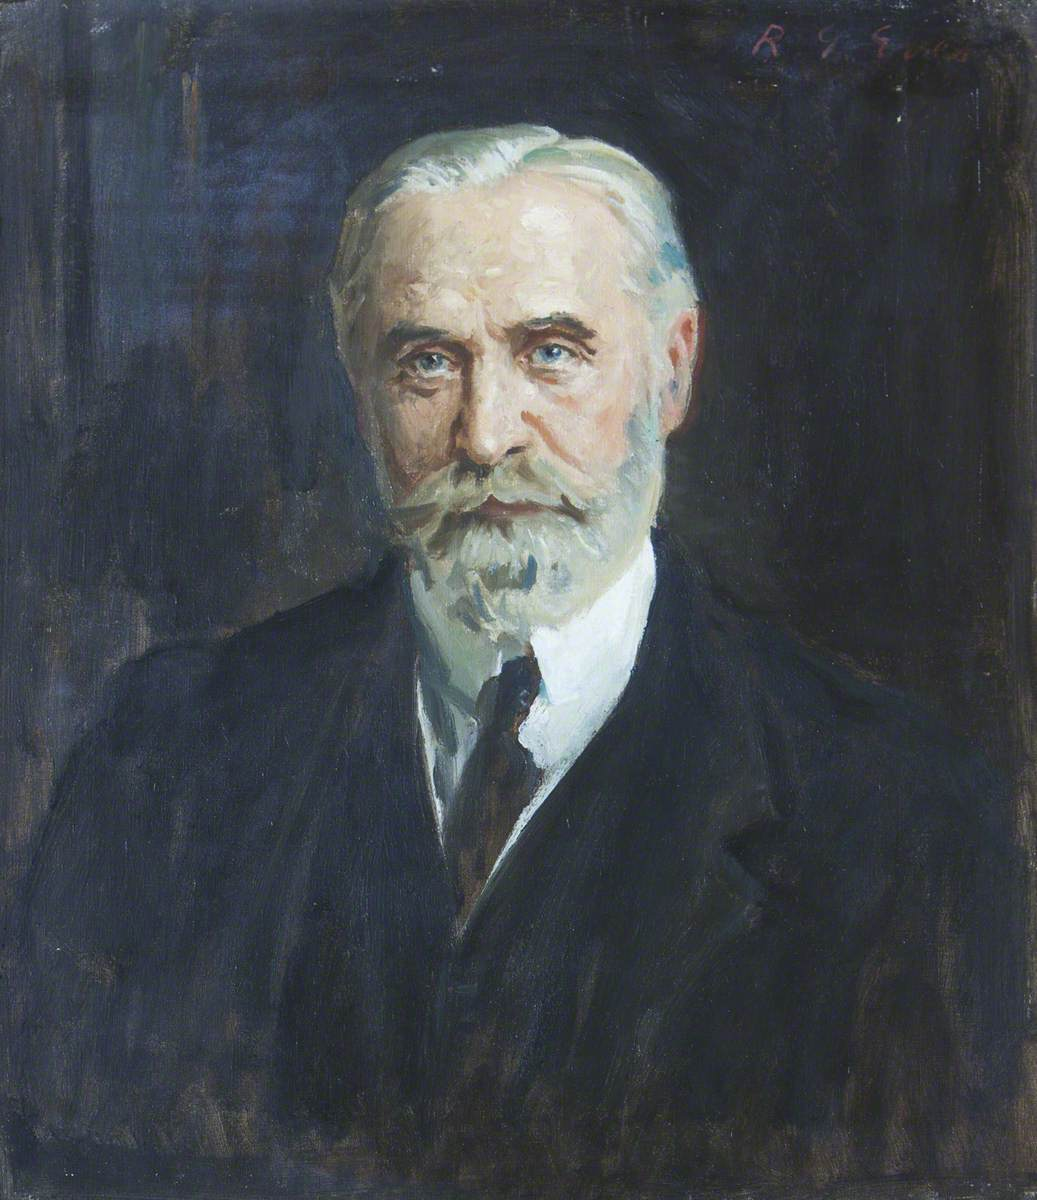 Eves, Reginald Grenville, 1876-1941; Francis Herbert Bradley (1846-1924)